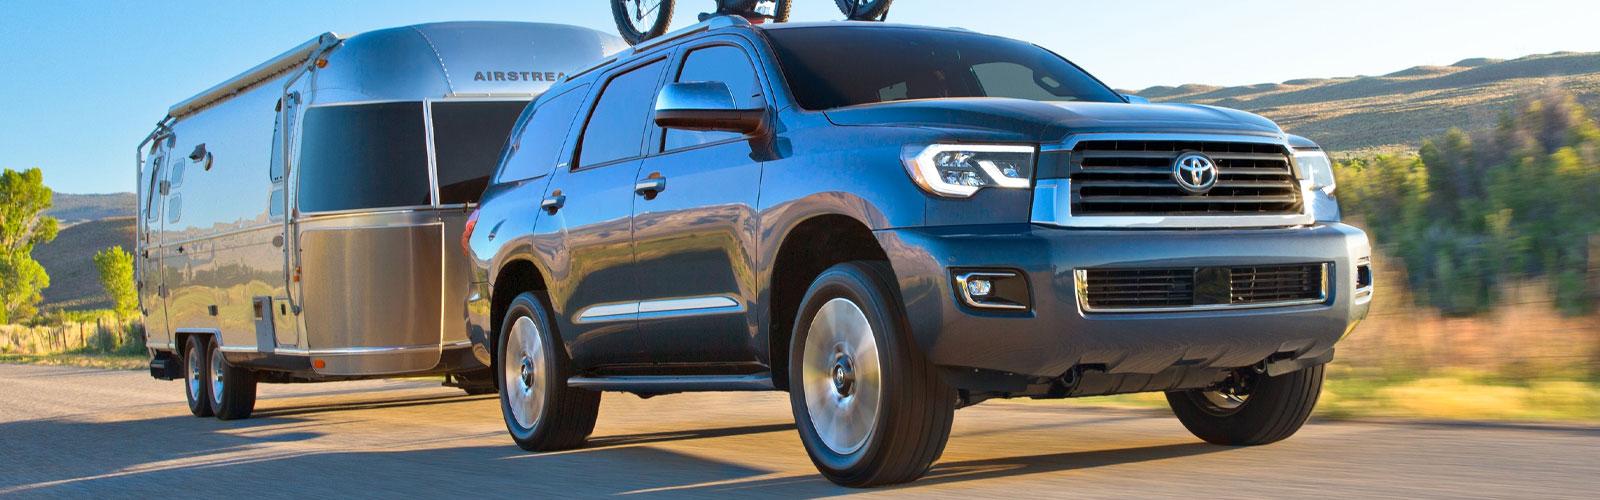 2020 Toyota Sequoia SUV Models For Sale In Grenada, Mississippi